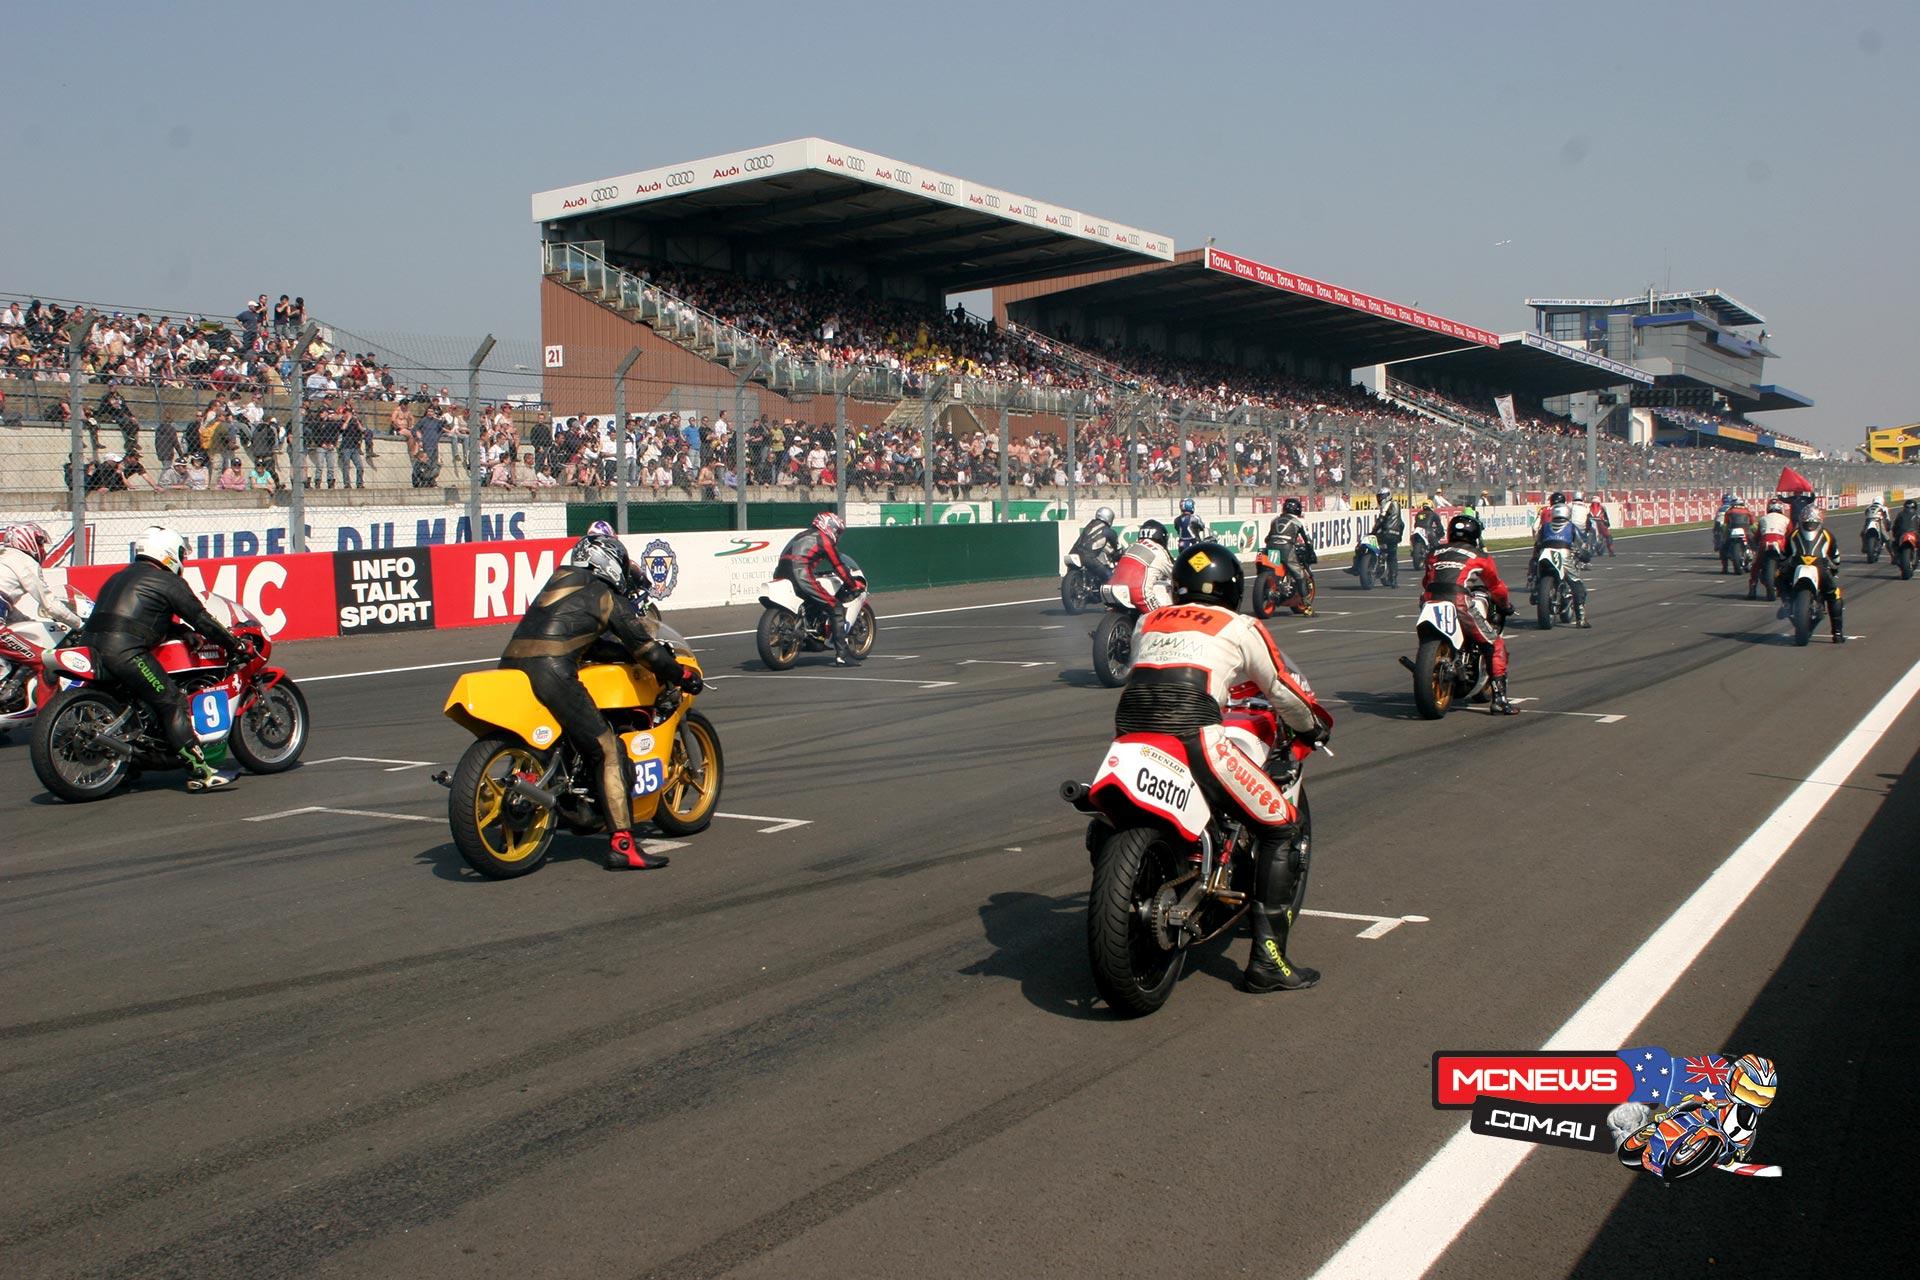 International Classic Grand Prix (ICGP)